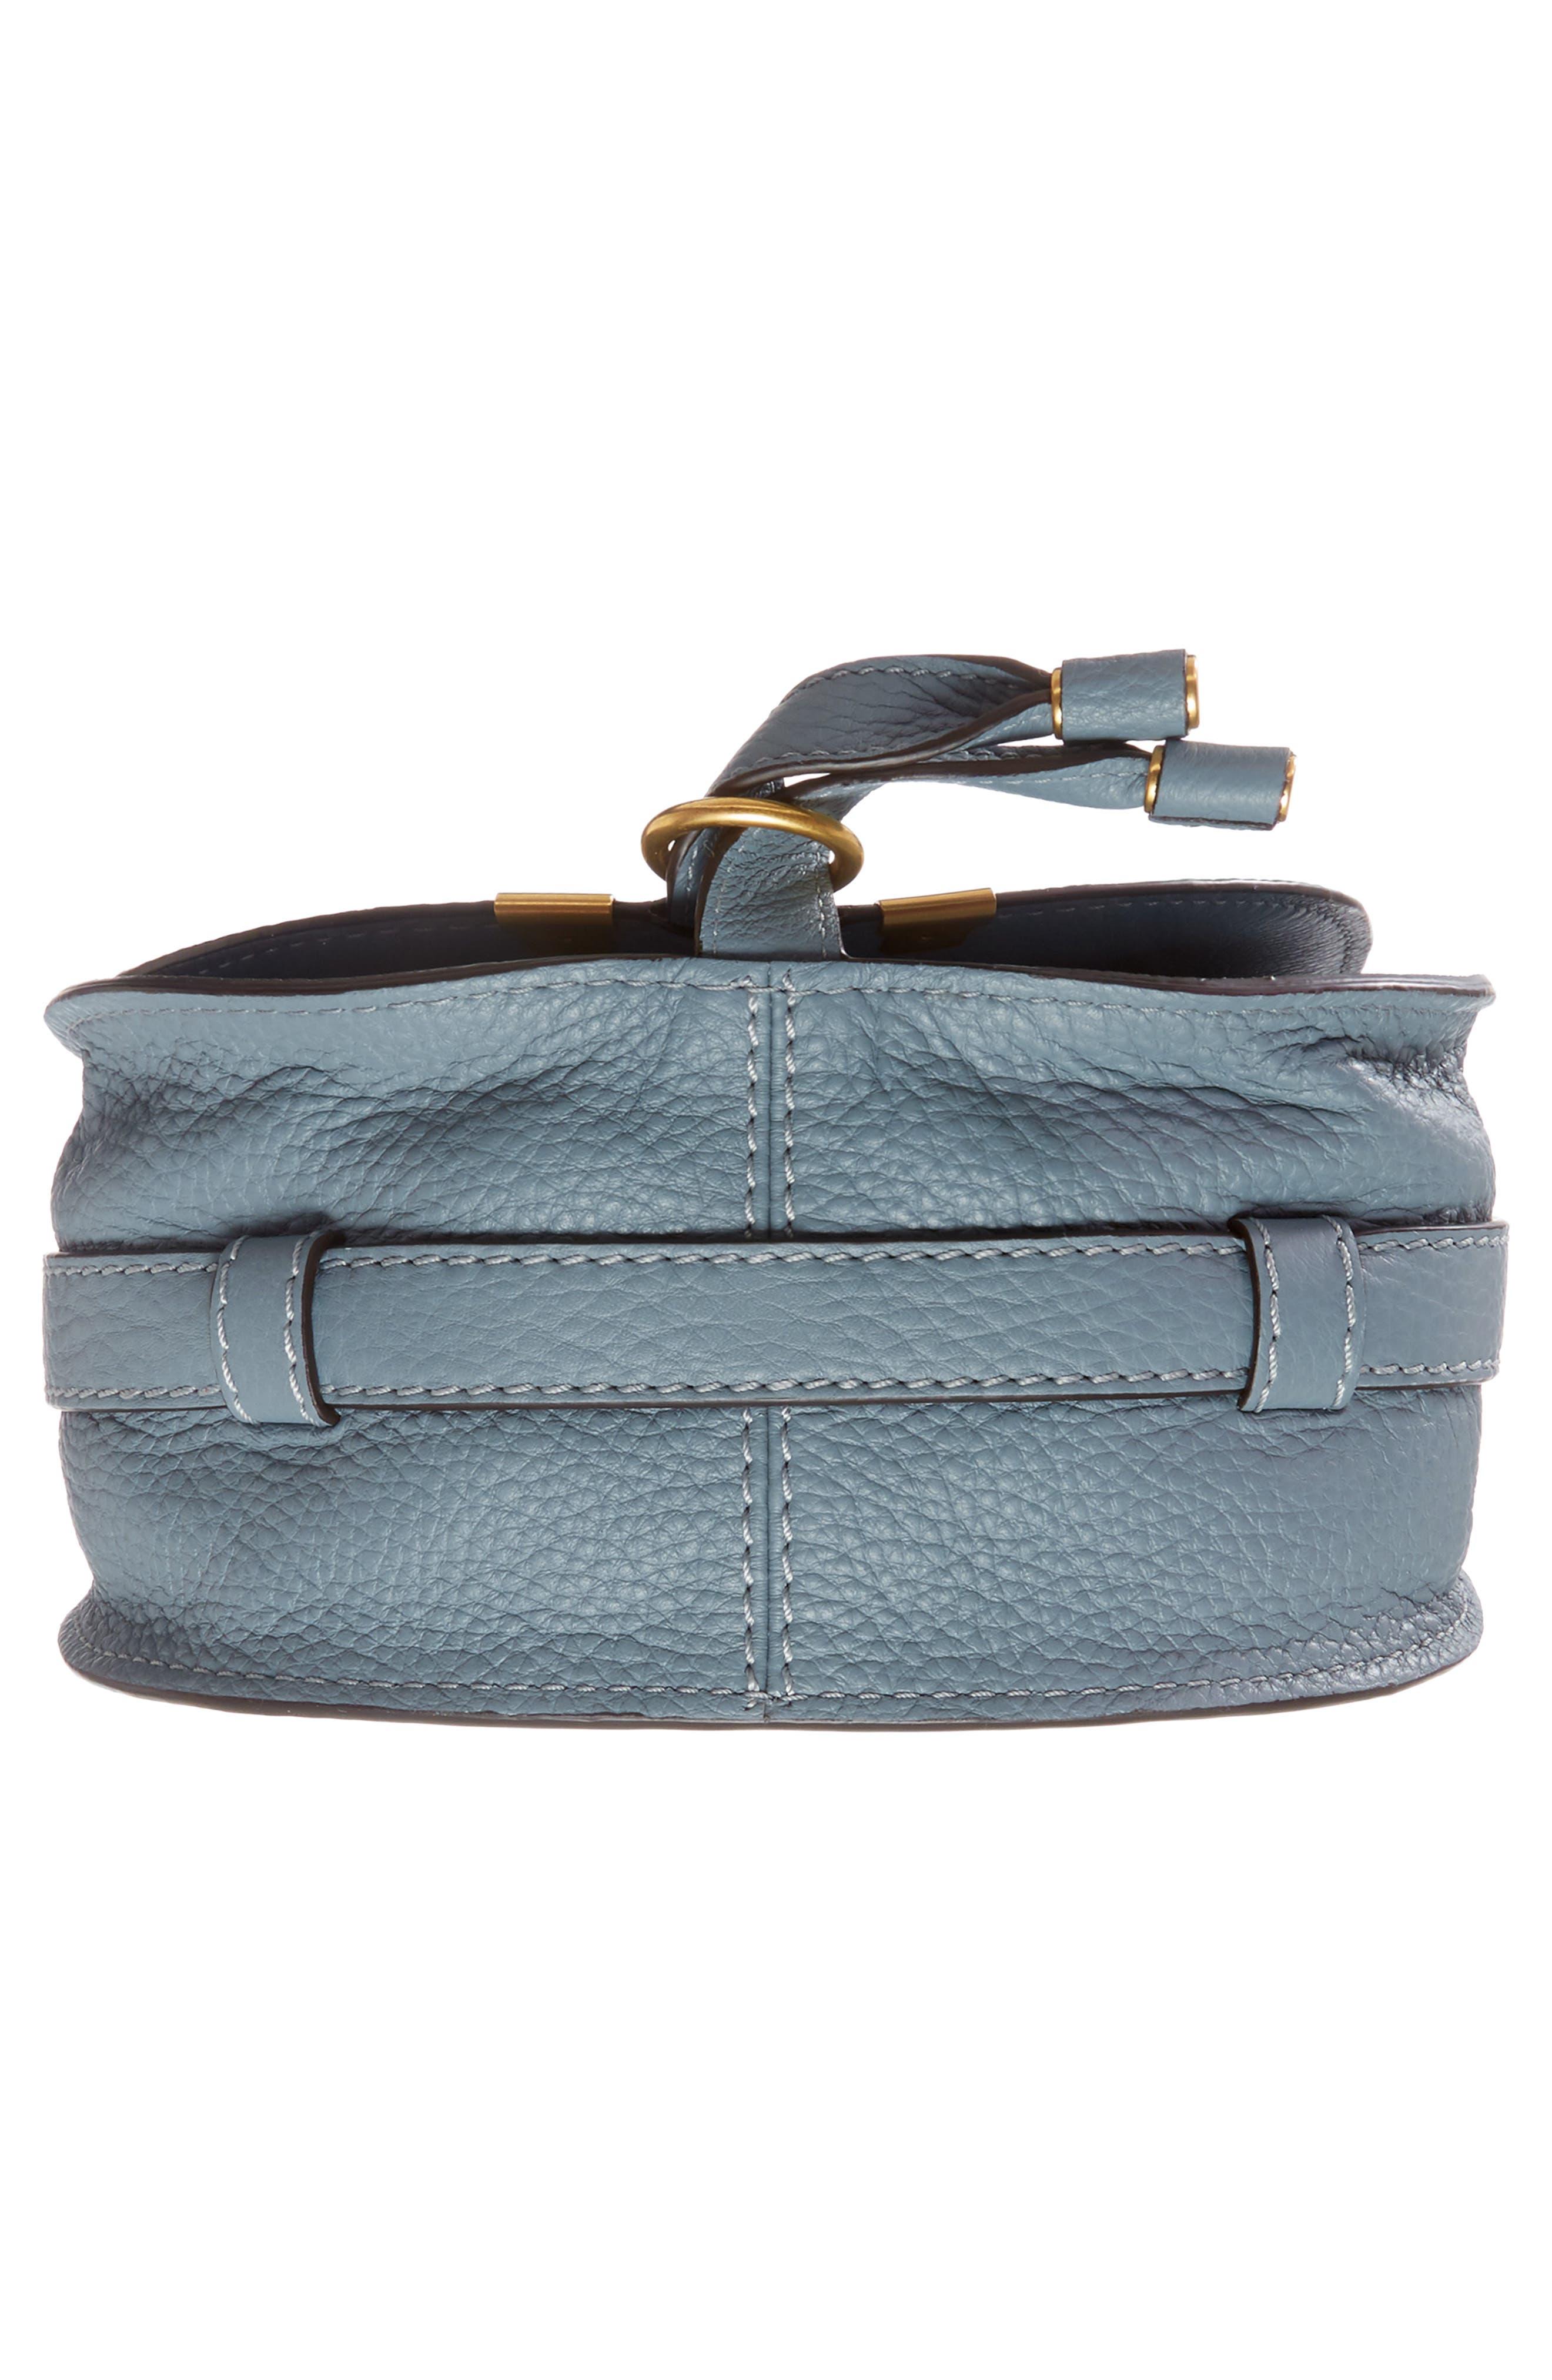 'Mini Marcie' Leather Crossbody Bag,                             Alternate thumbnail 6, color,                             BFC CLOUDY BLUE